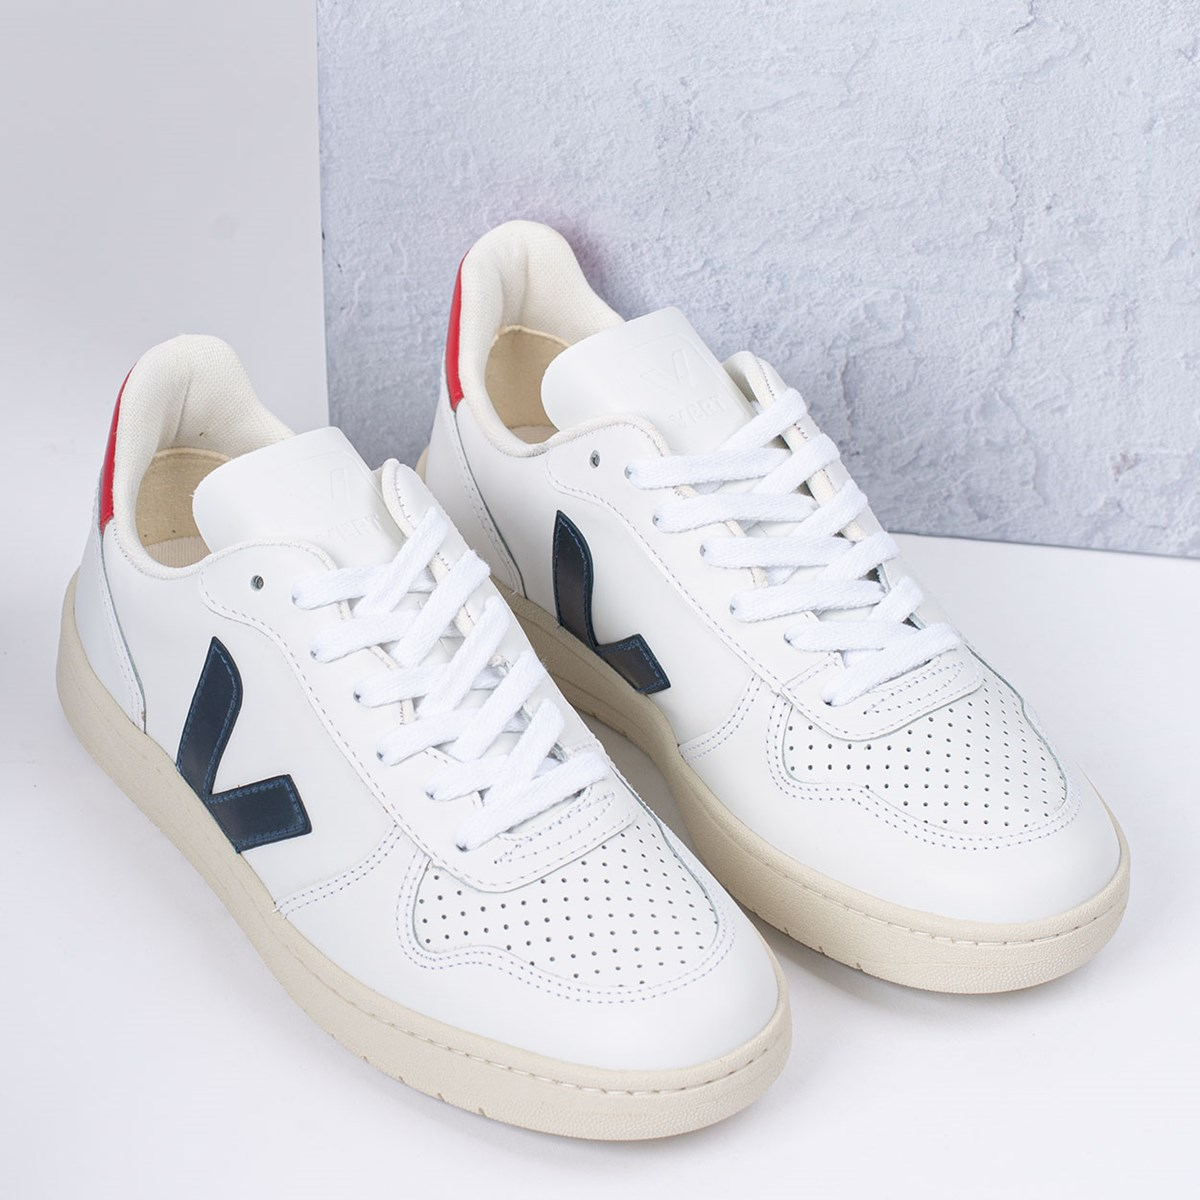 Tênis Vert Shoes V-10 Leather Extra White Nautico Pekin VX021267